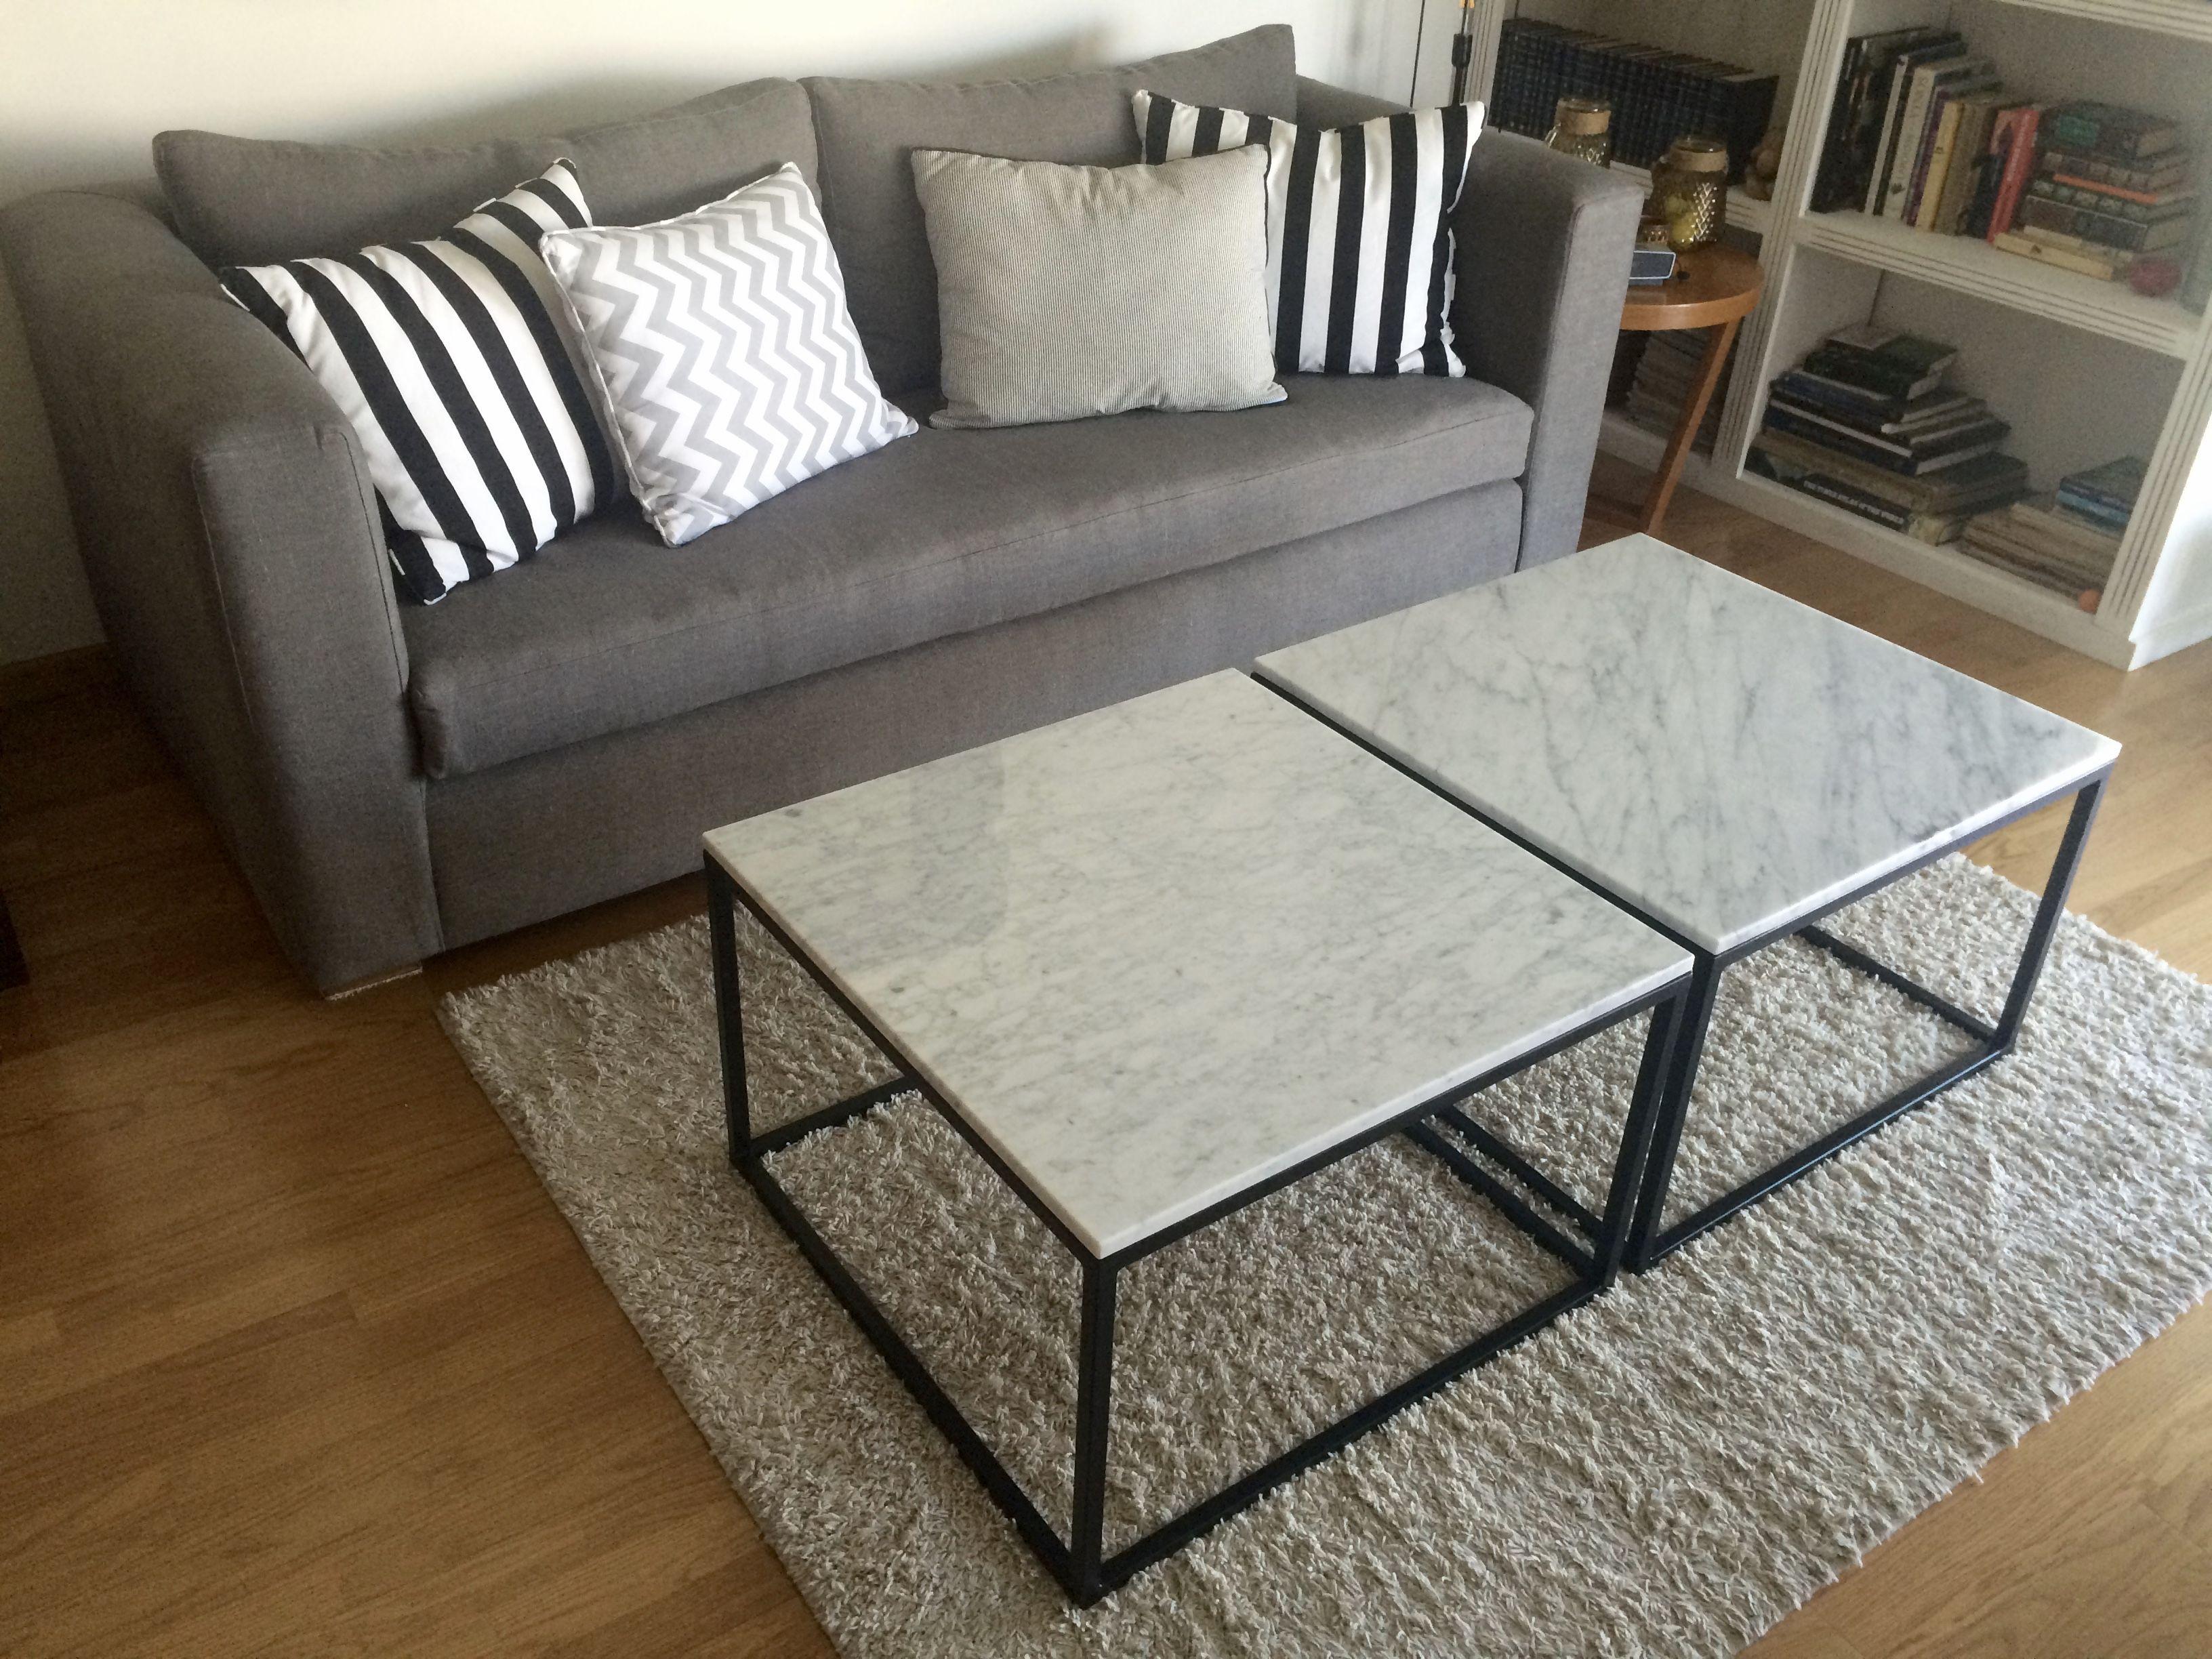 Sill³n Modelo Modena tapizado en Lino gris y mesas de mármol de